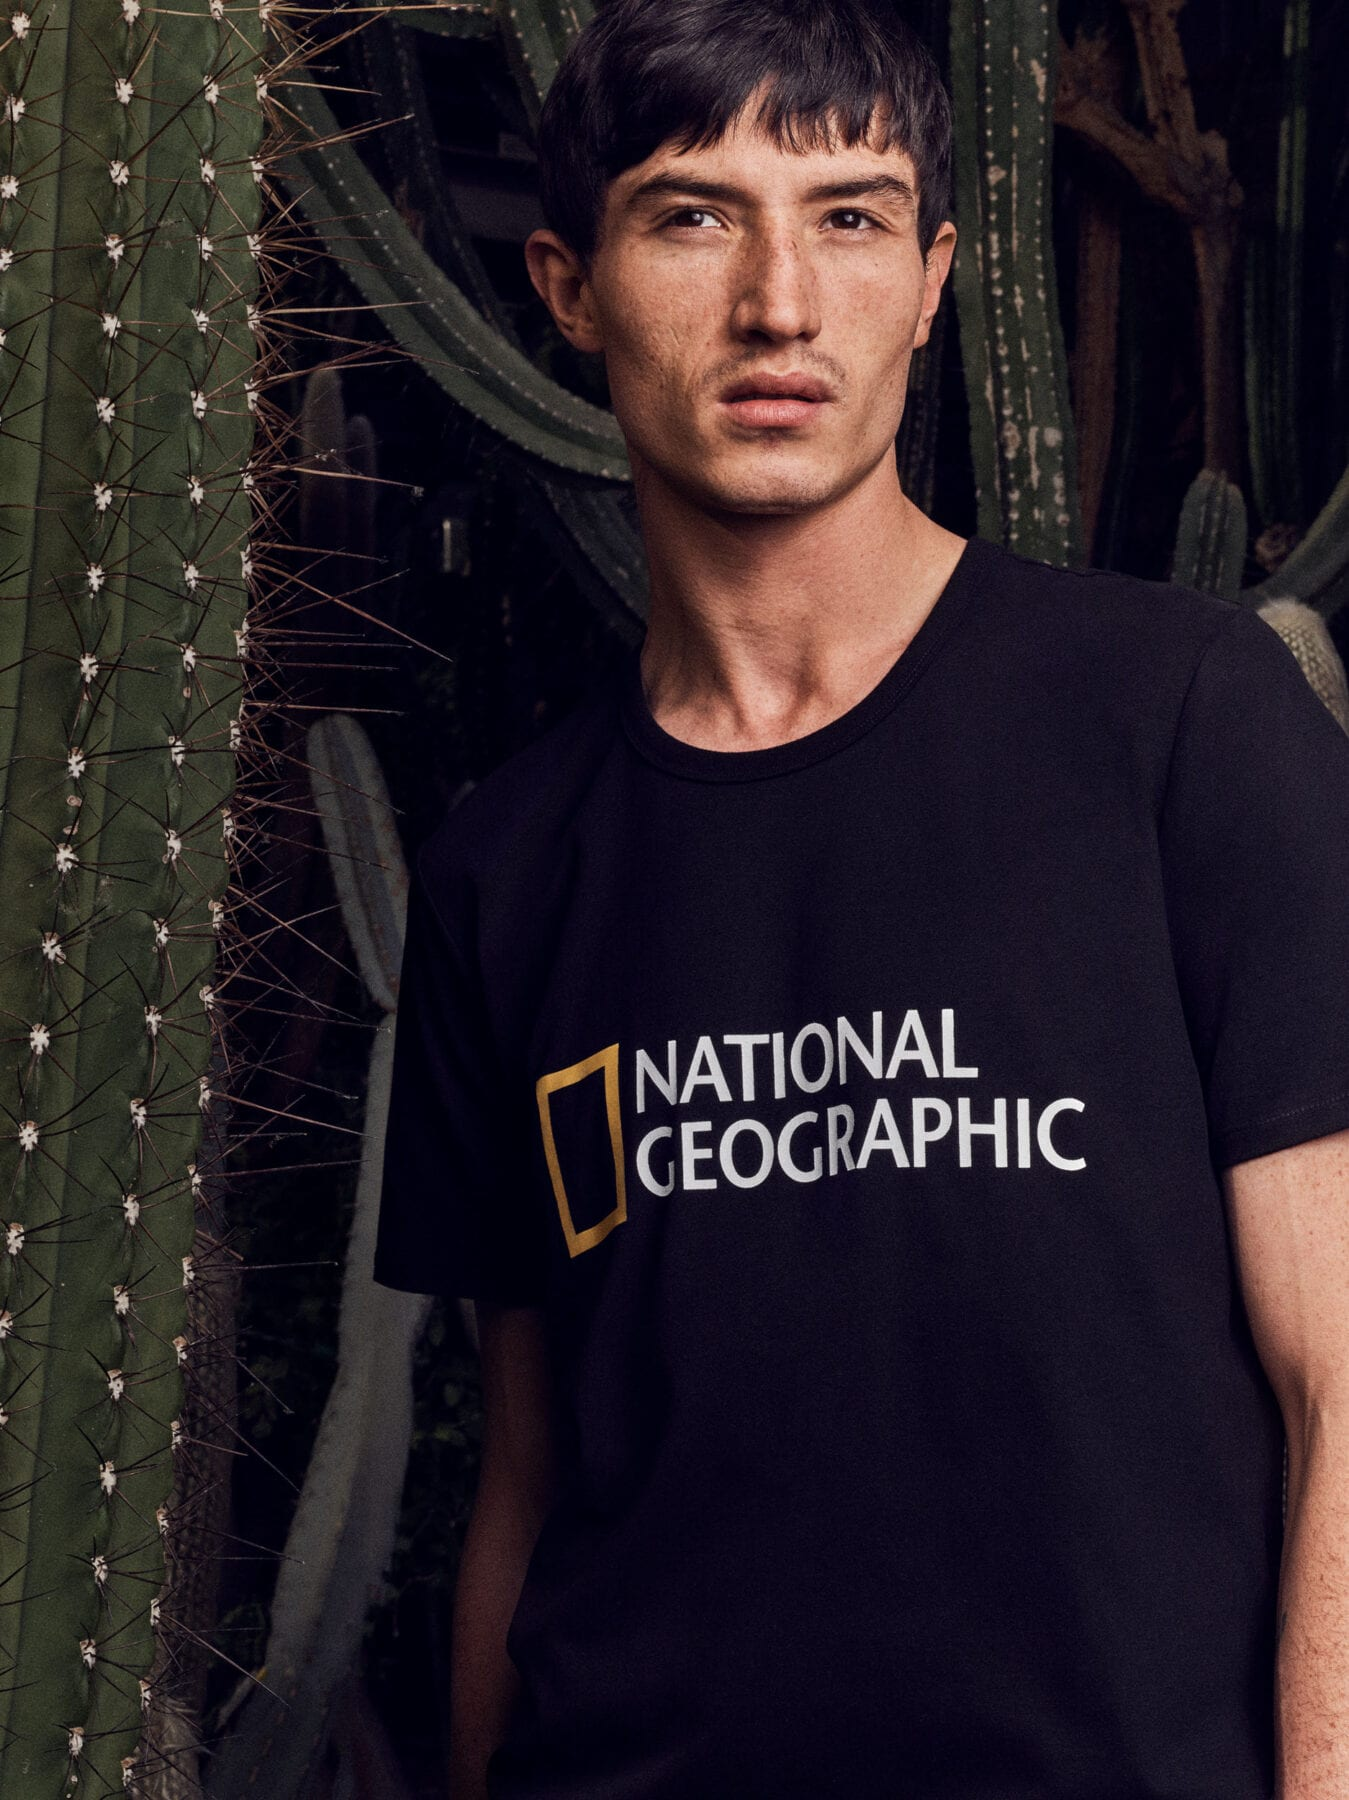 National Geographic kledinglijn